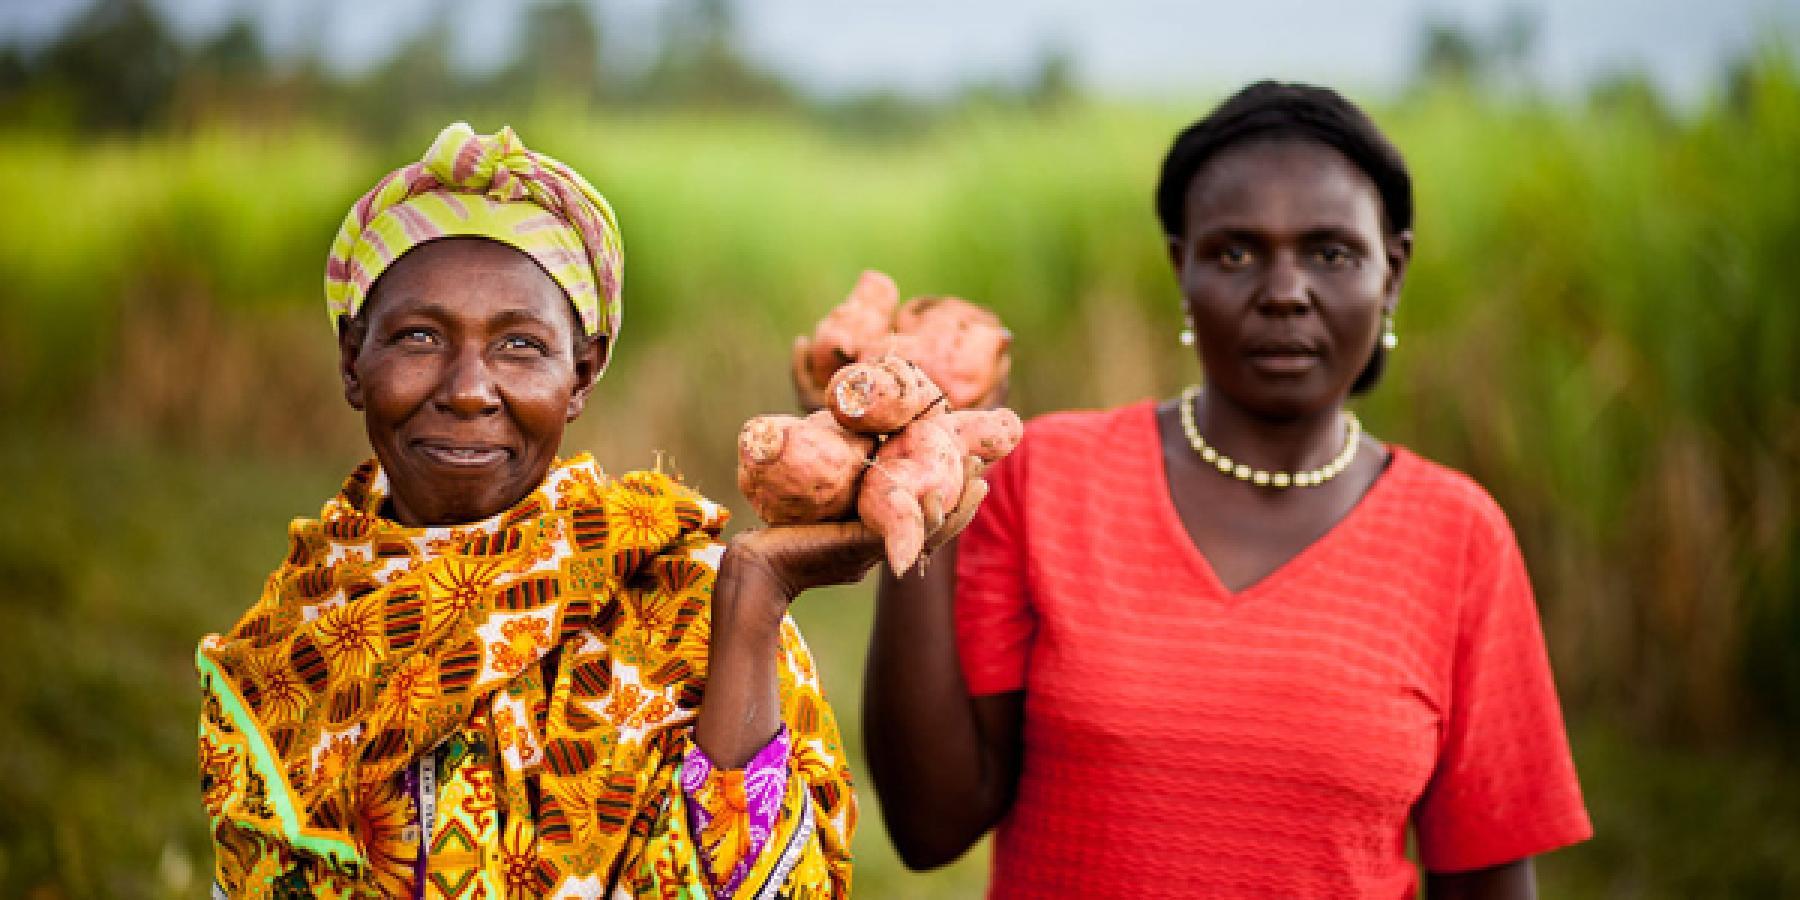 Women Grow Nutritious Crops